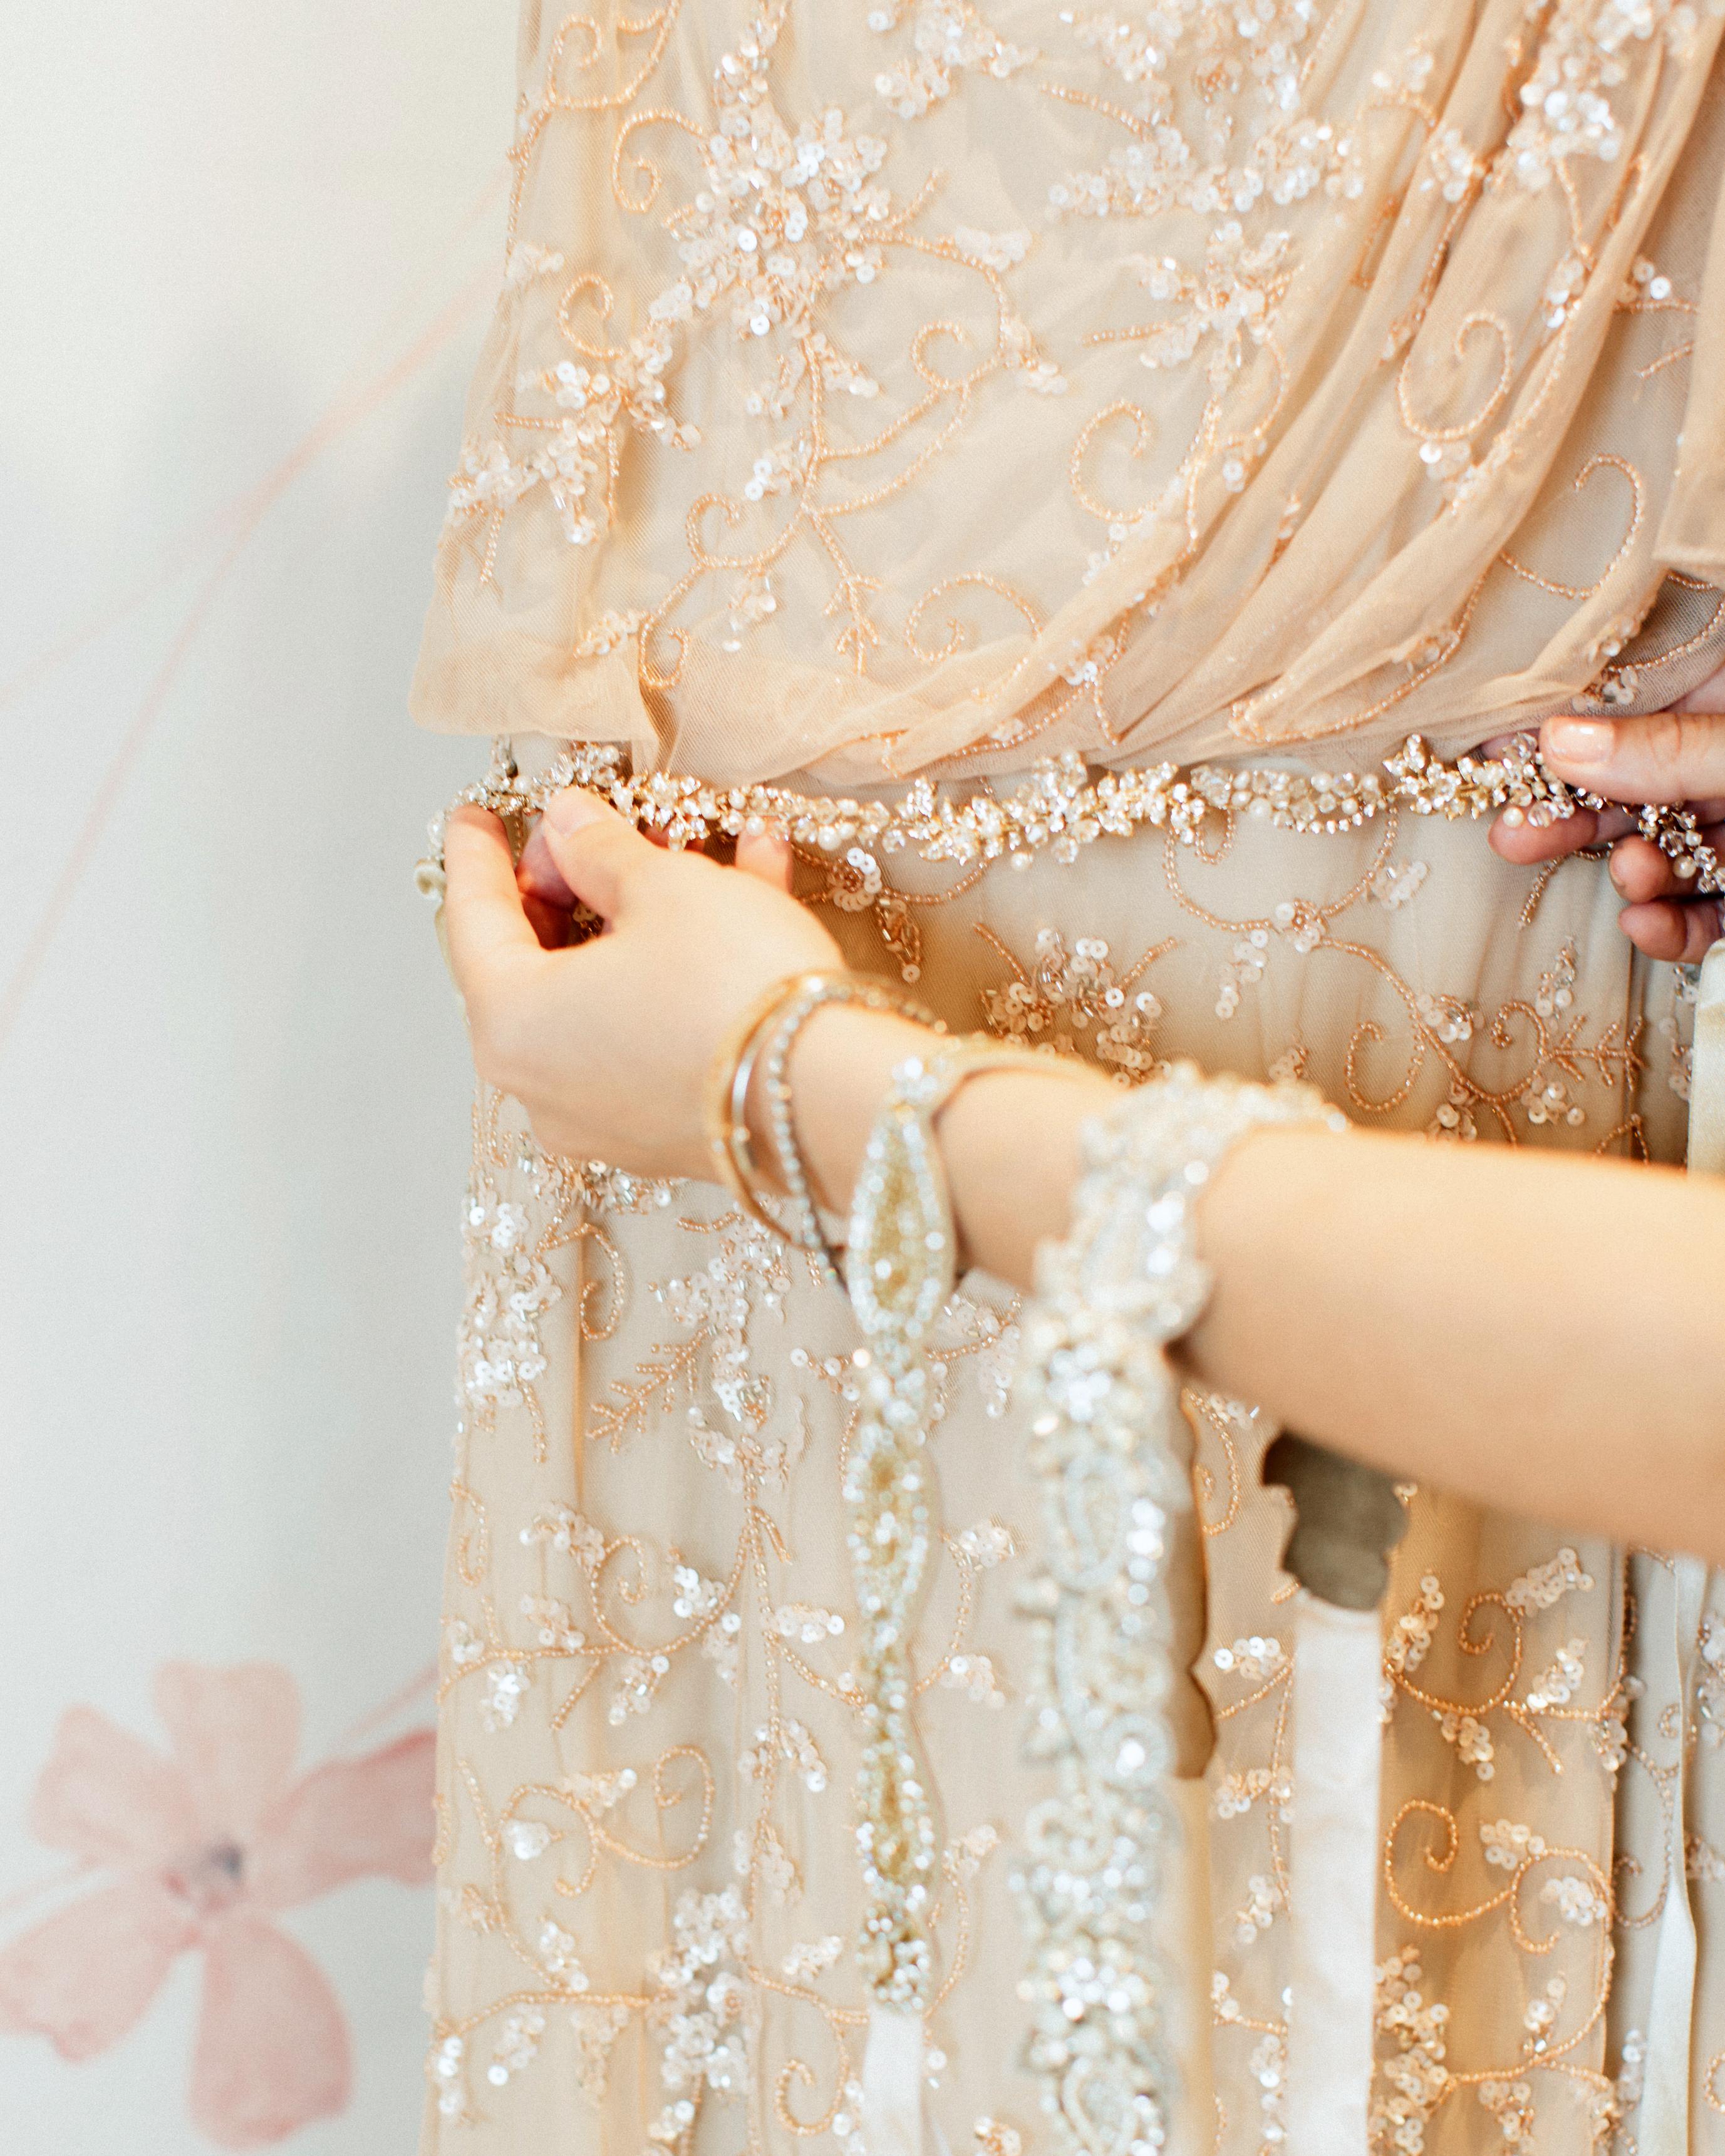 jenny-bernheim-bridesmaids-bhldn-23-s112679-1115.jpg